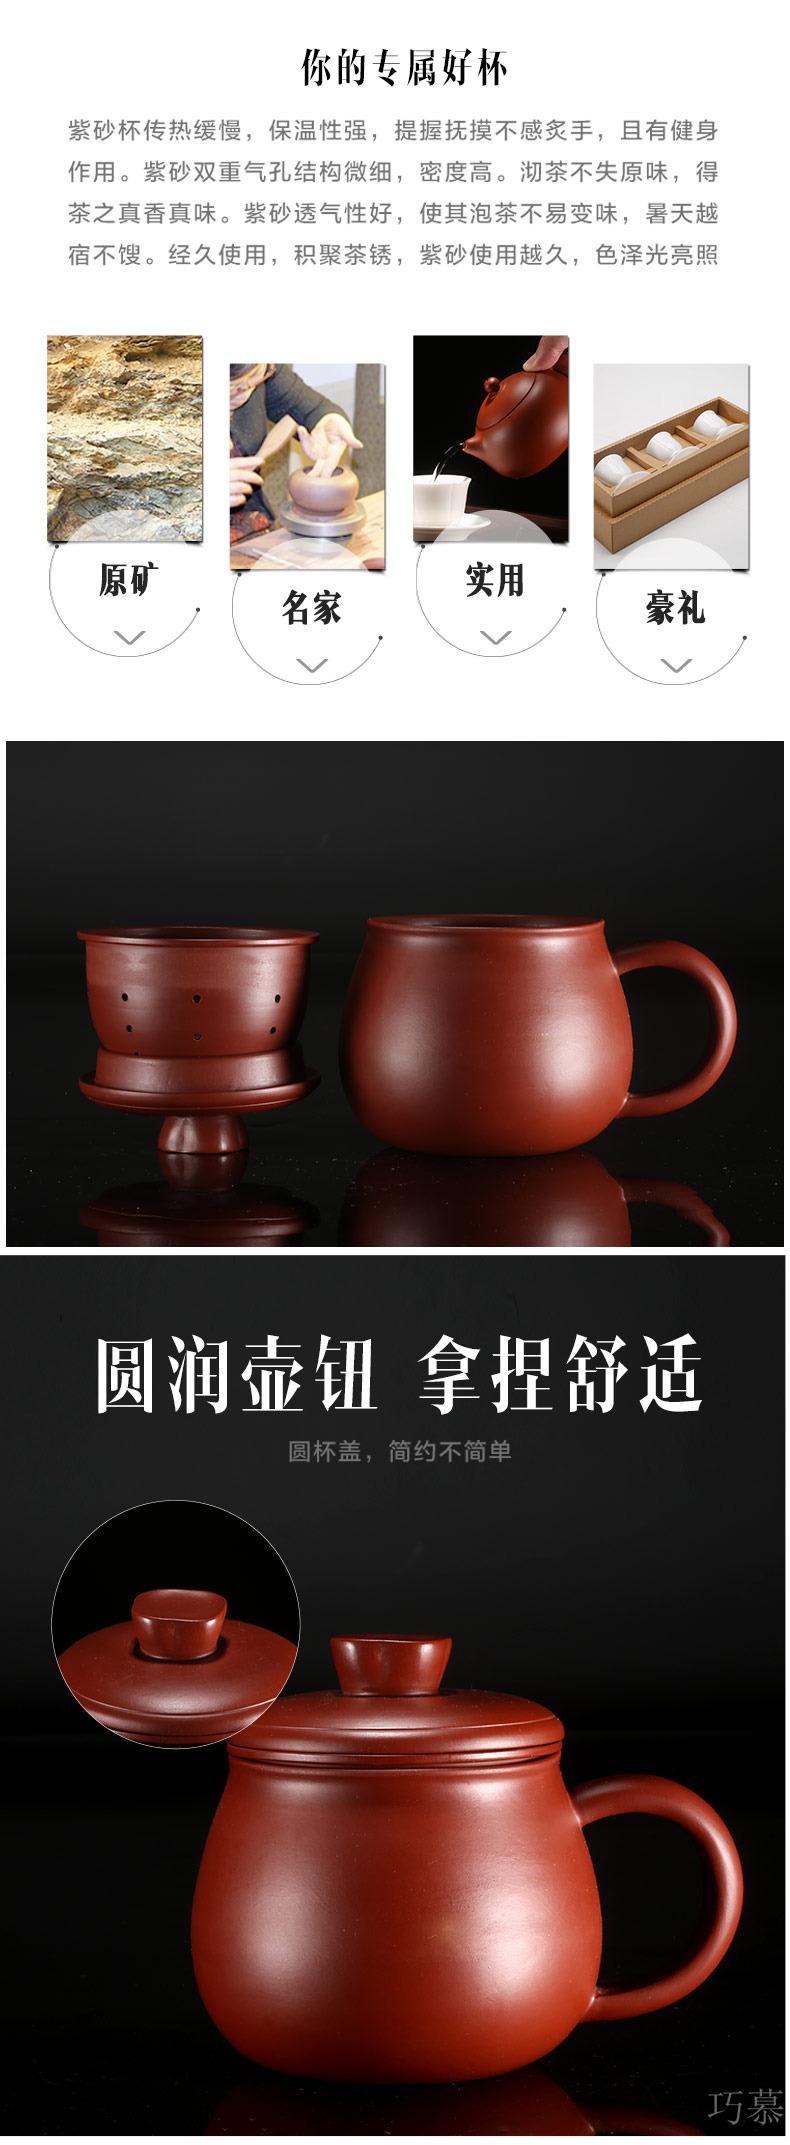 Qiao mu SU purple sand cup yixing purple sand cup manually undressed ore belt filter tank make tea cup custom office